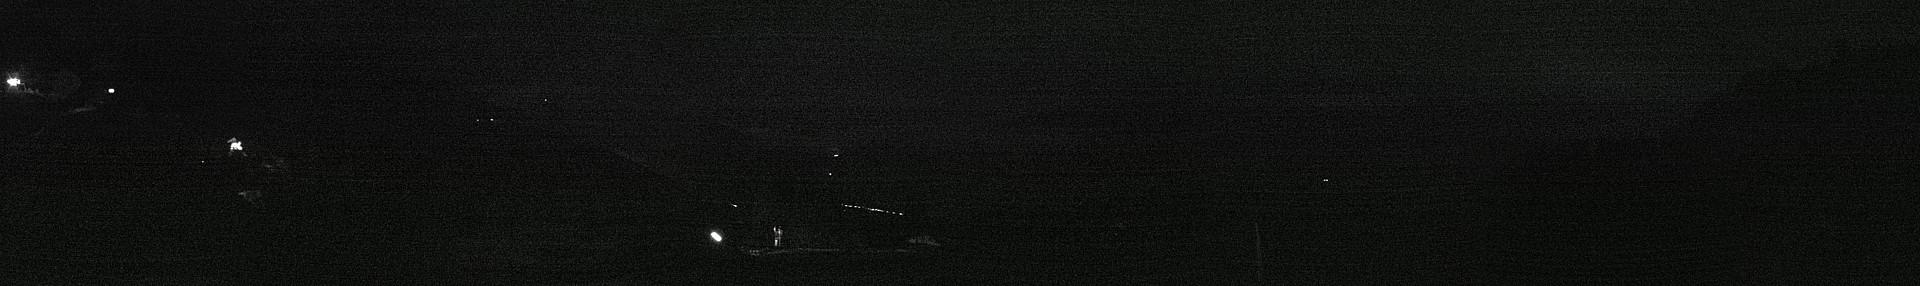 Embergeralm Panorama